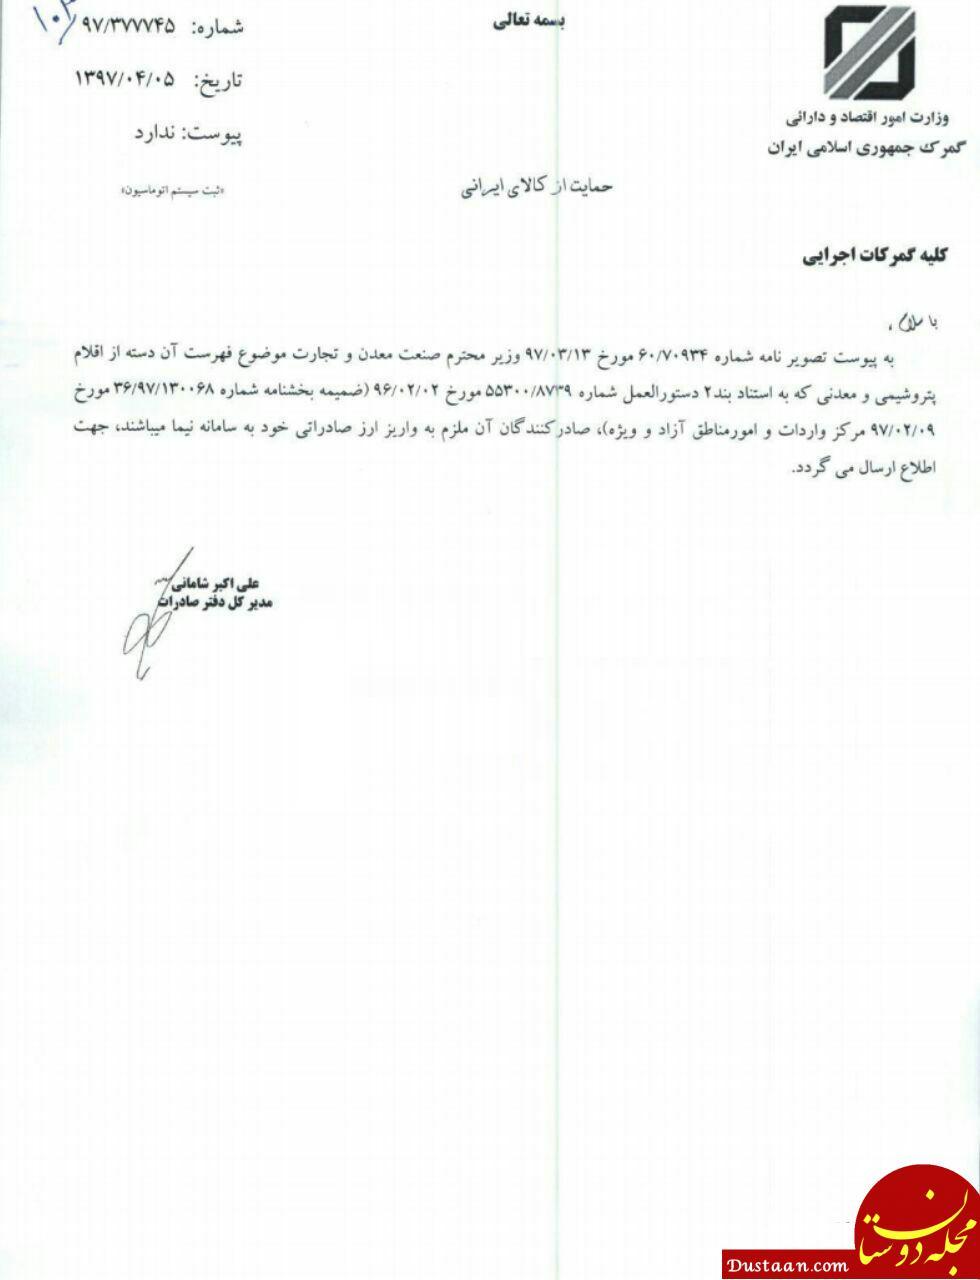 www.dustaan.com فروش ارز پتروشیمیها در بازار ممنوع شد +سند